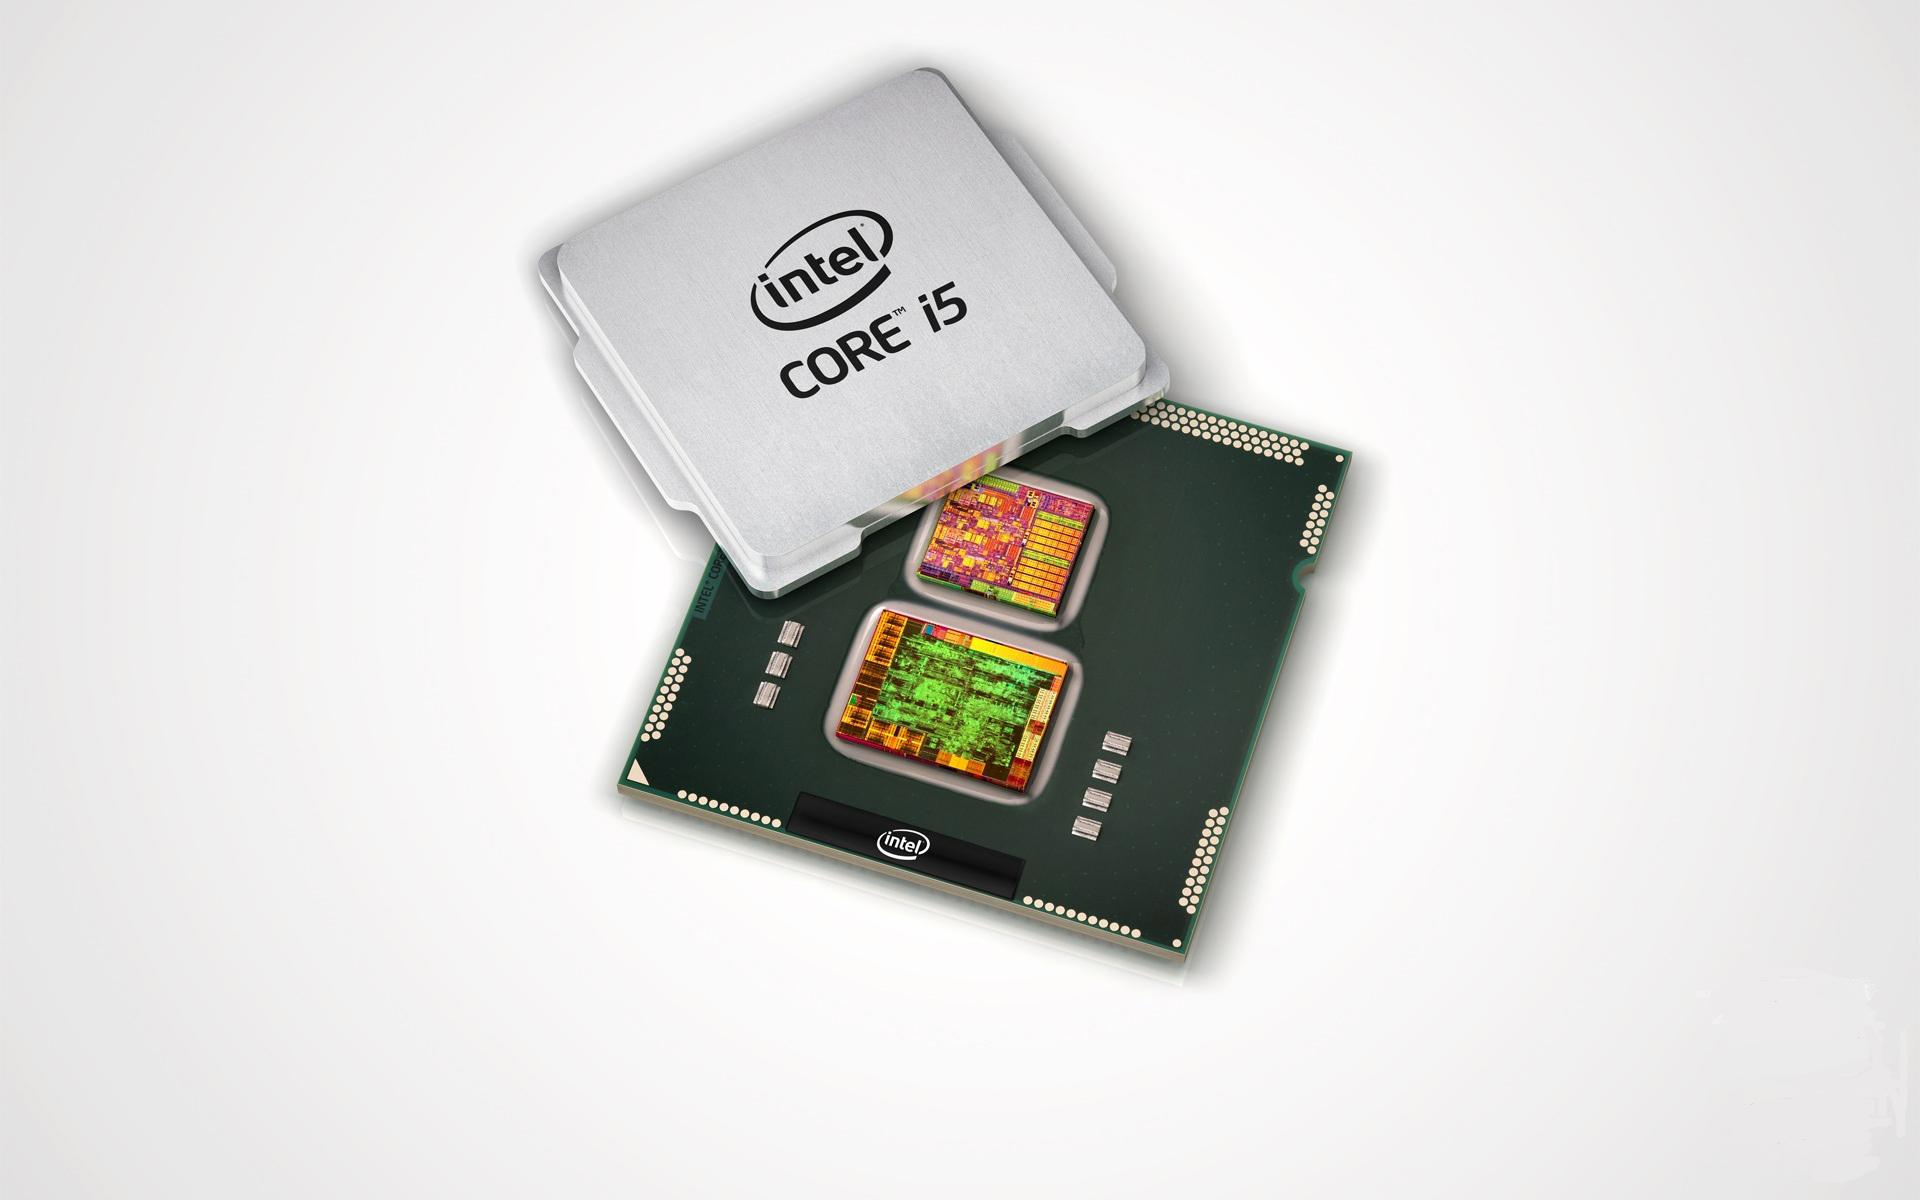 Intel core i5 die Intel core i5 die wallpaper   HD 99Wallpaper 1920x1200